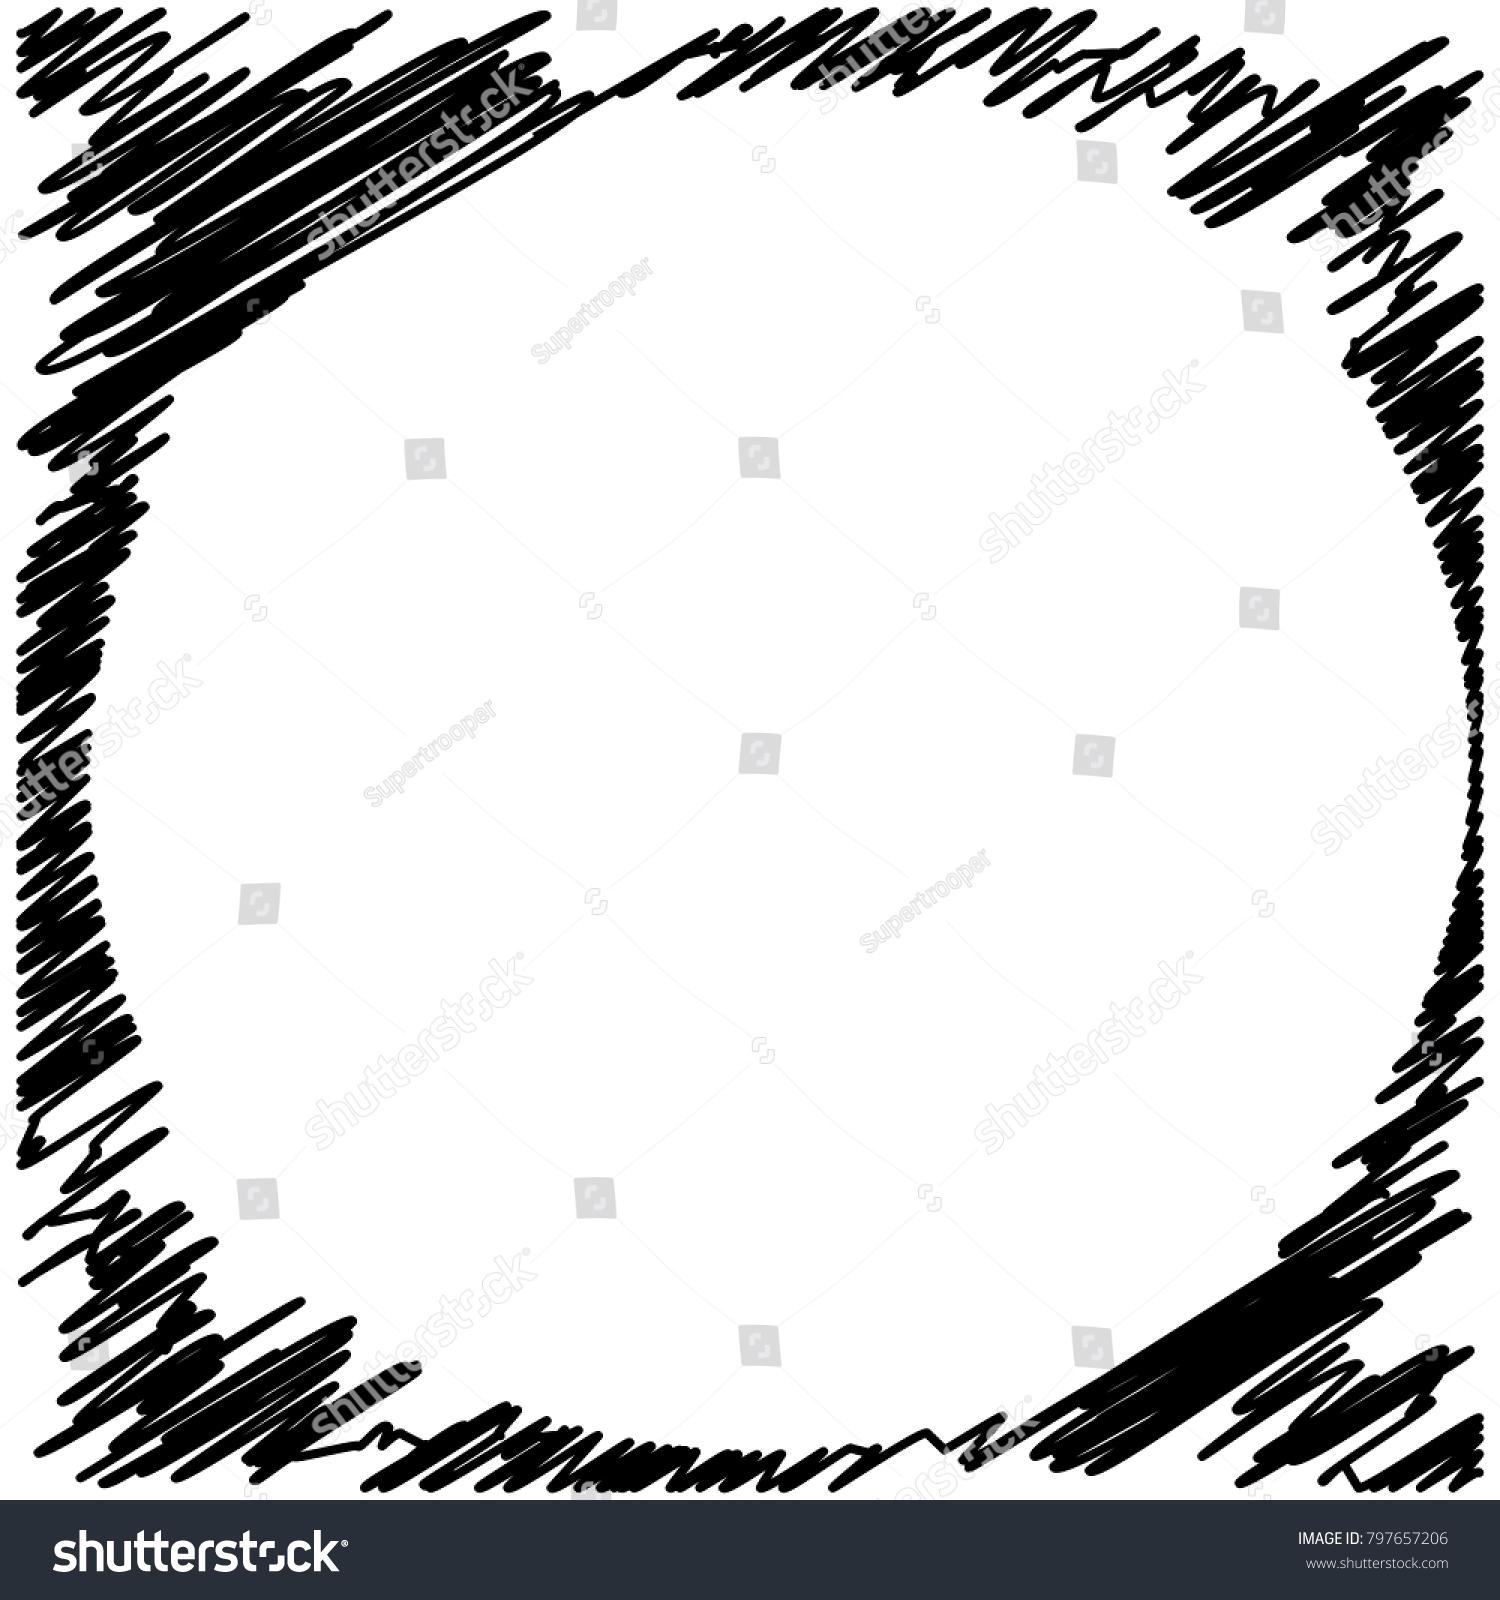 circle hatching grunge graphite pencil background stock vector rh shutterstock com grunge red vector background grunge background vector 1280x720